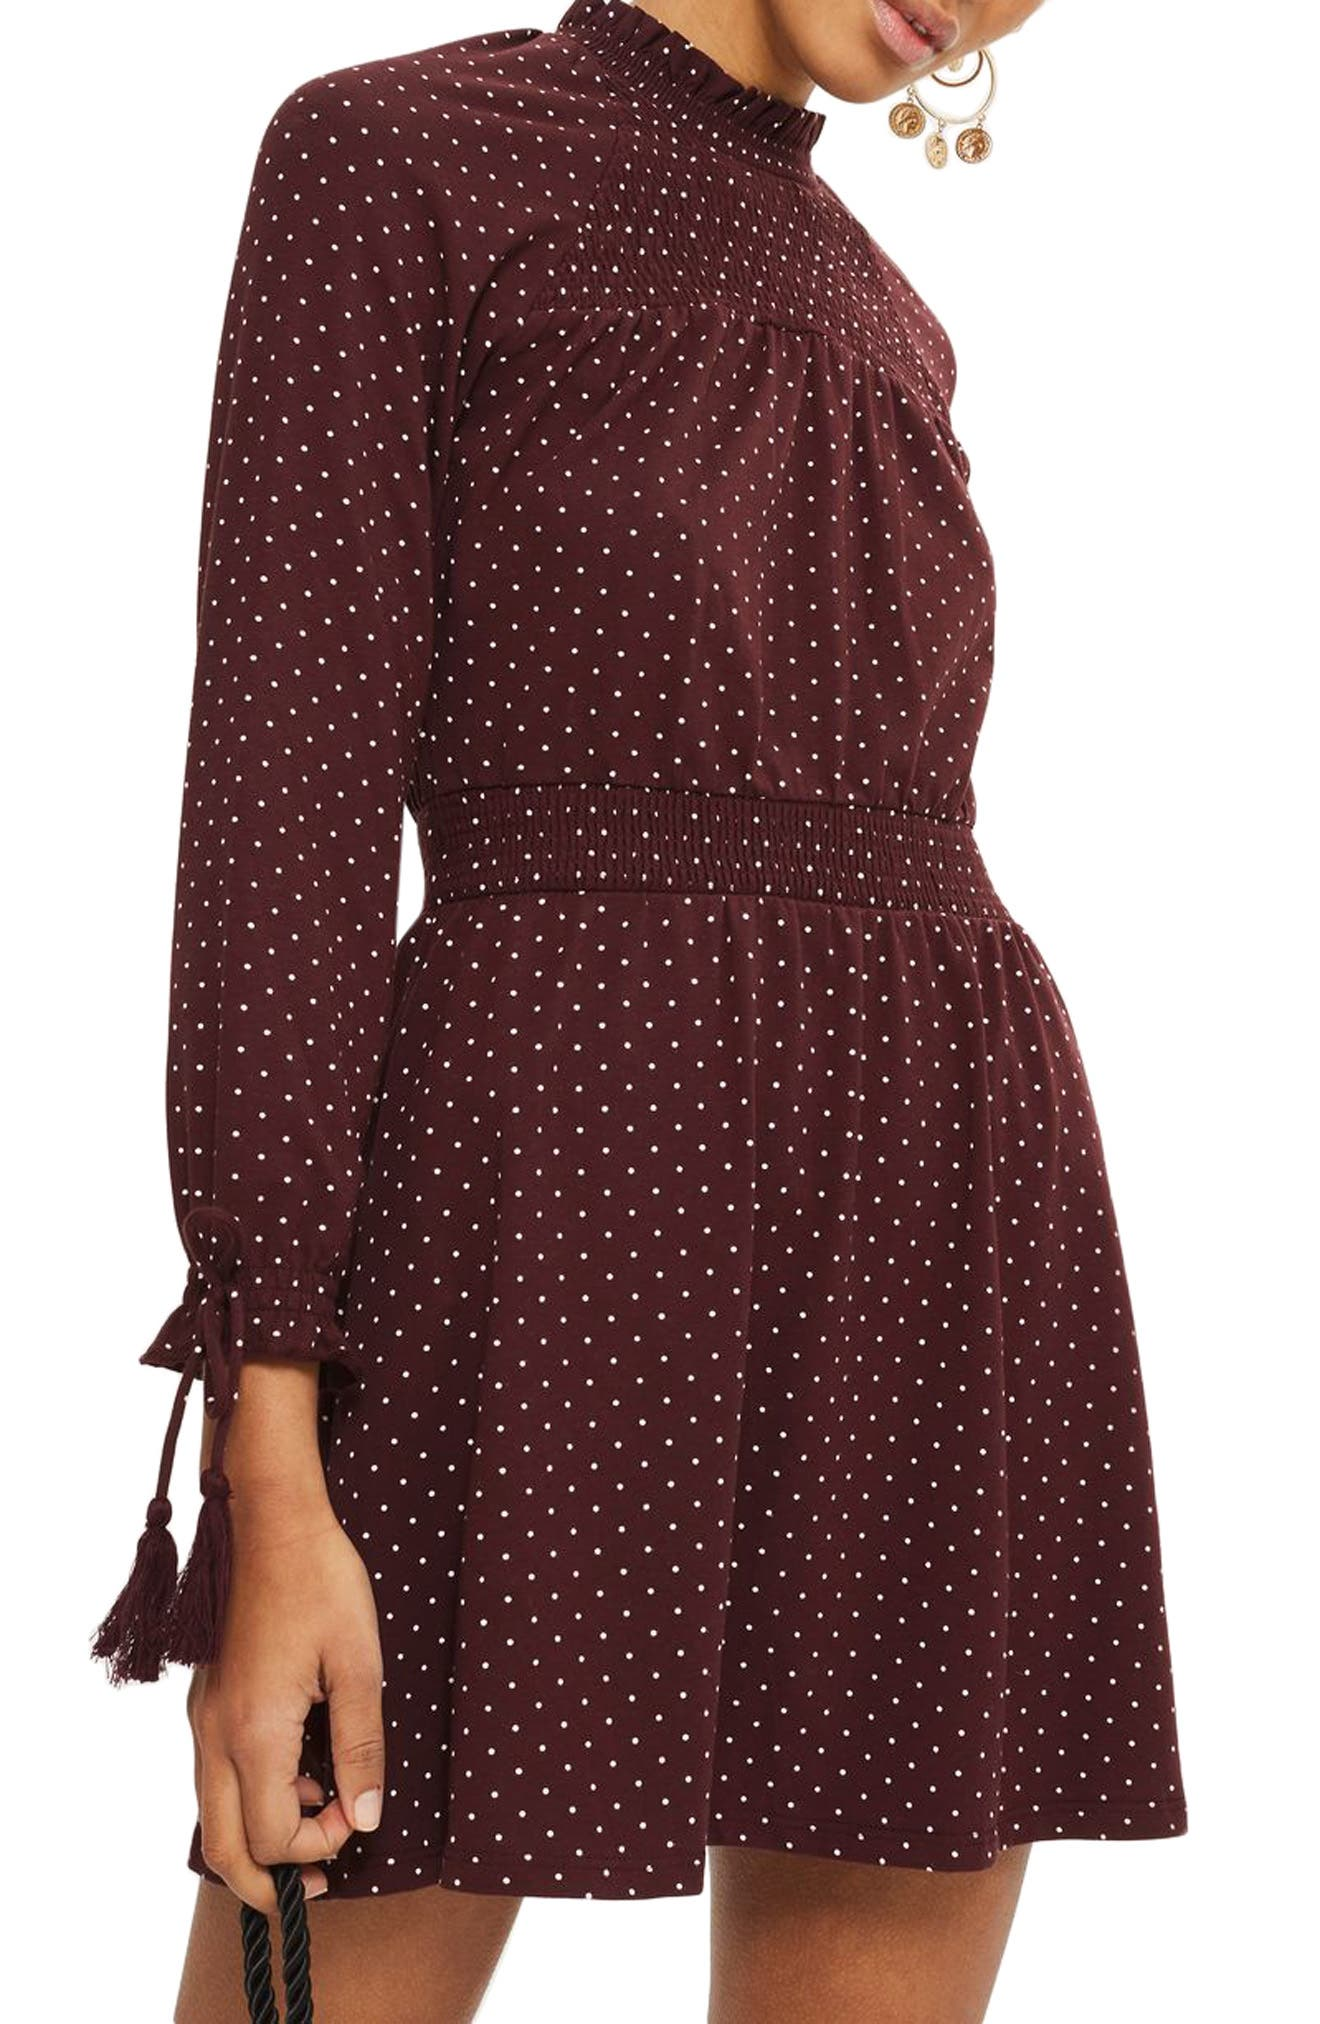 Alternate Image 1 Selected - Topshop Polka Dot Shirred Waist Dress